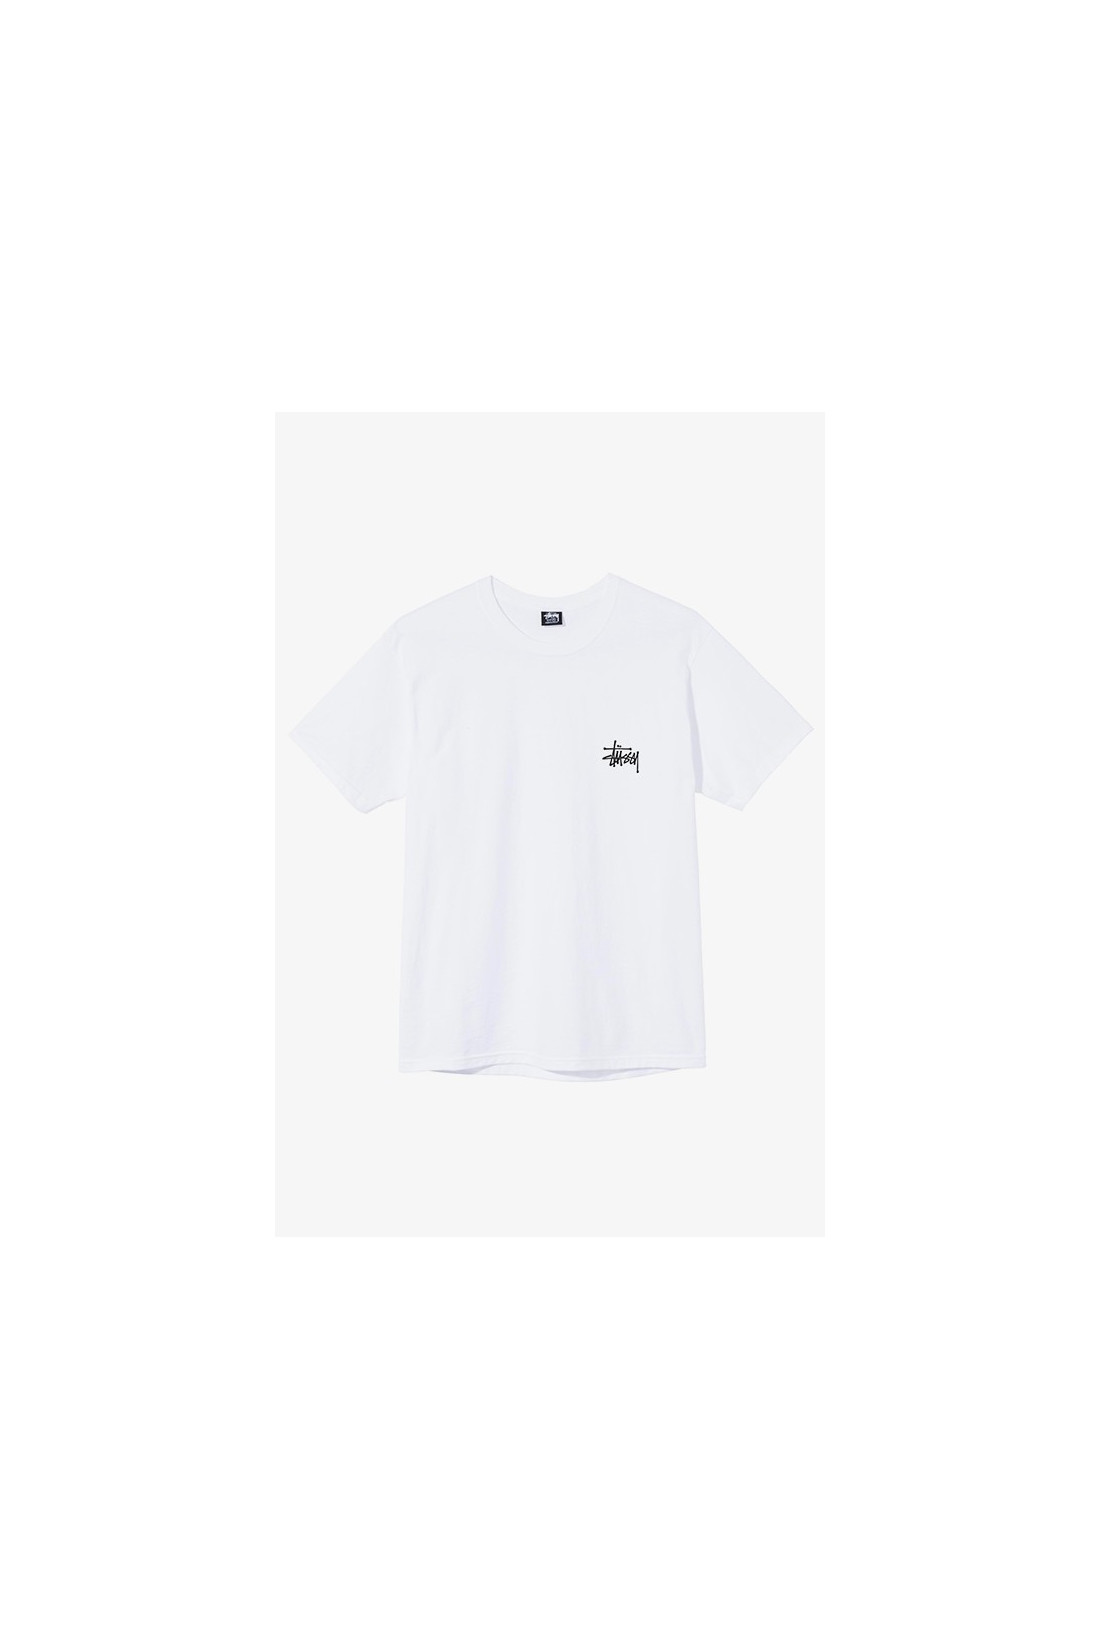 STUSSY / Basic stussy tee White